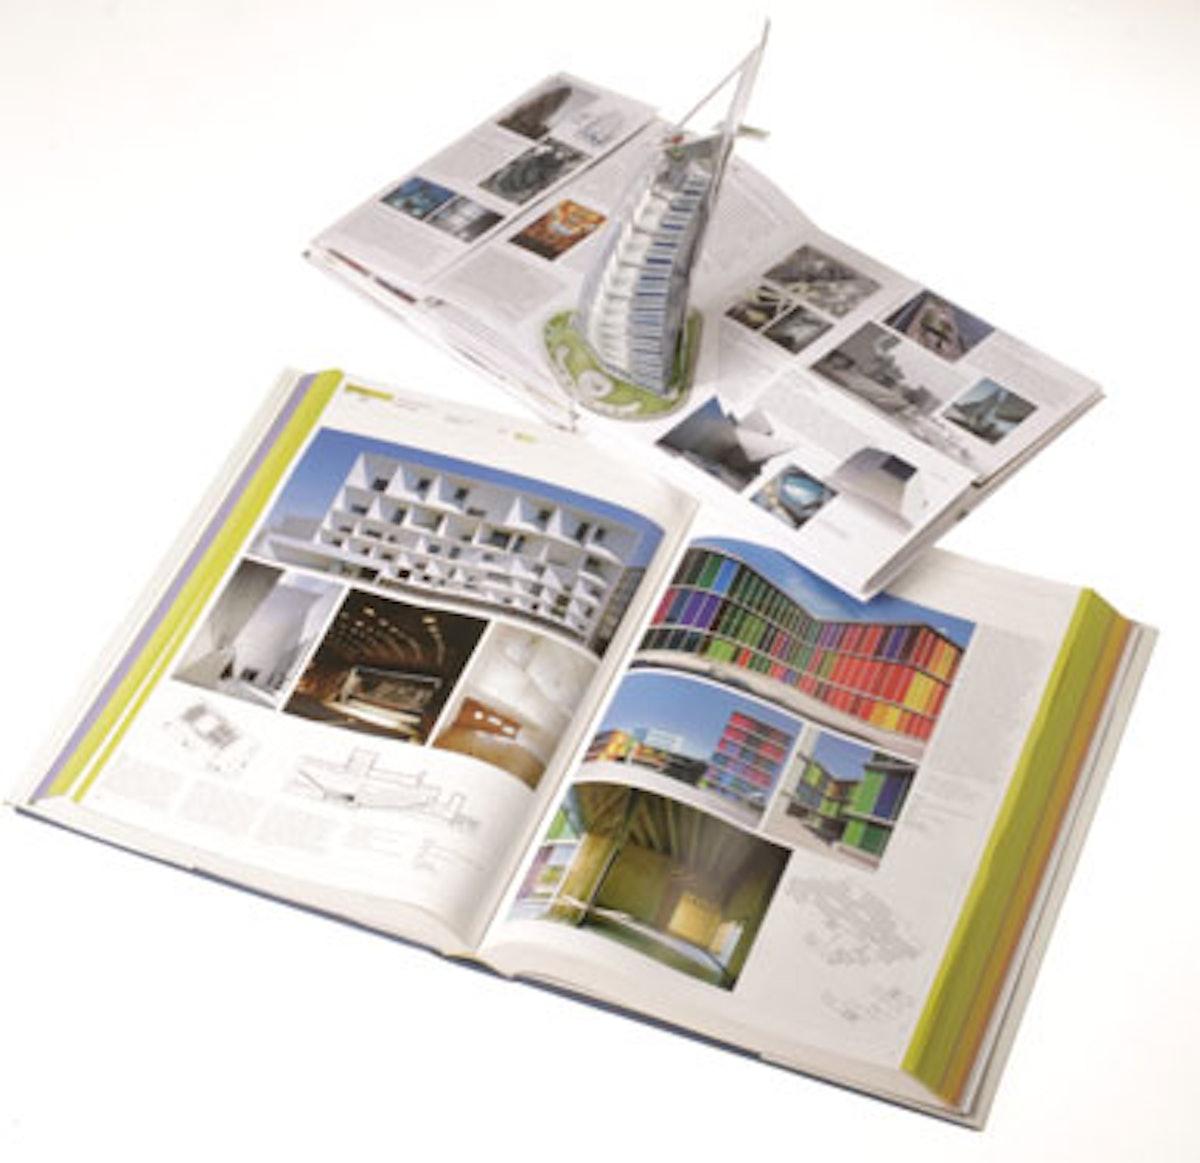 blog_art_books_arch.jpg